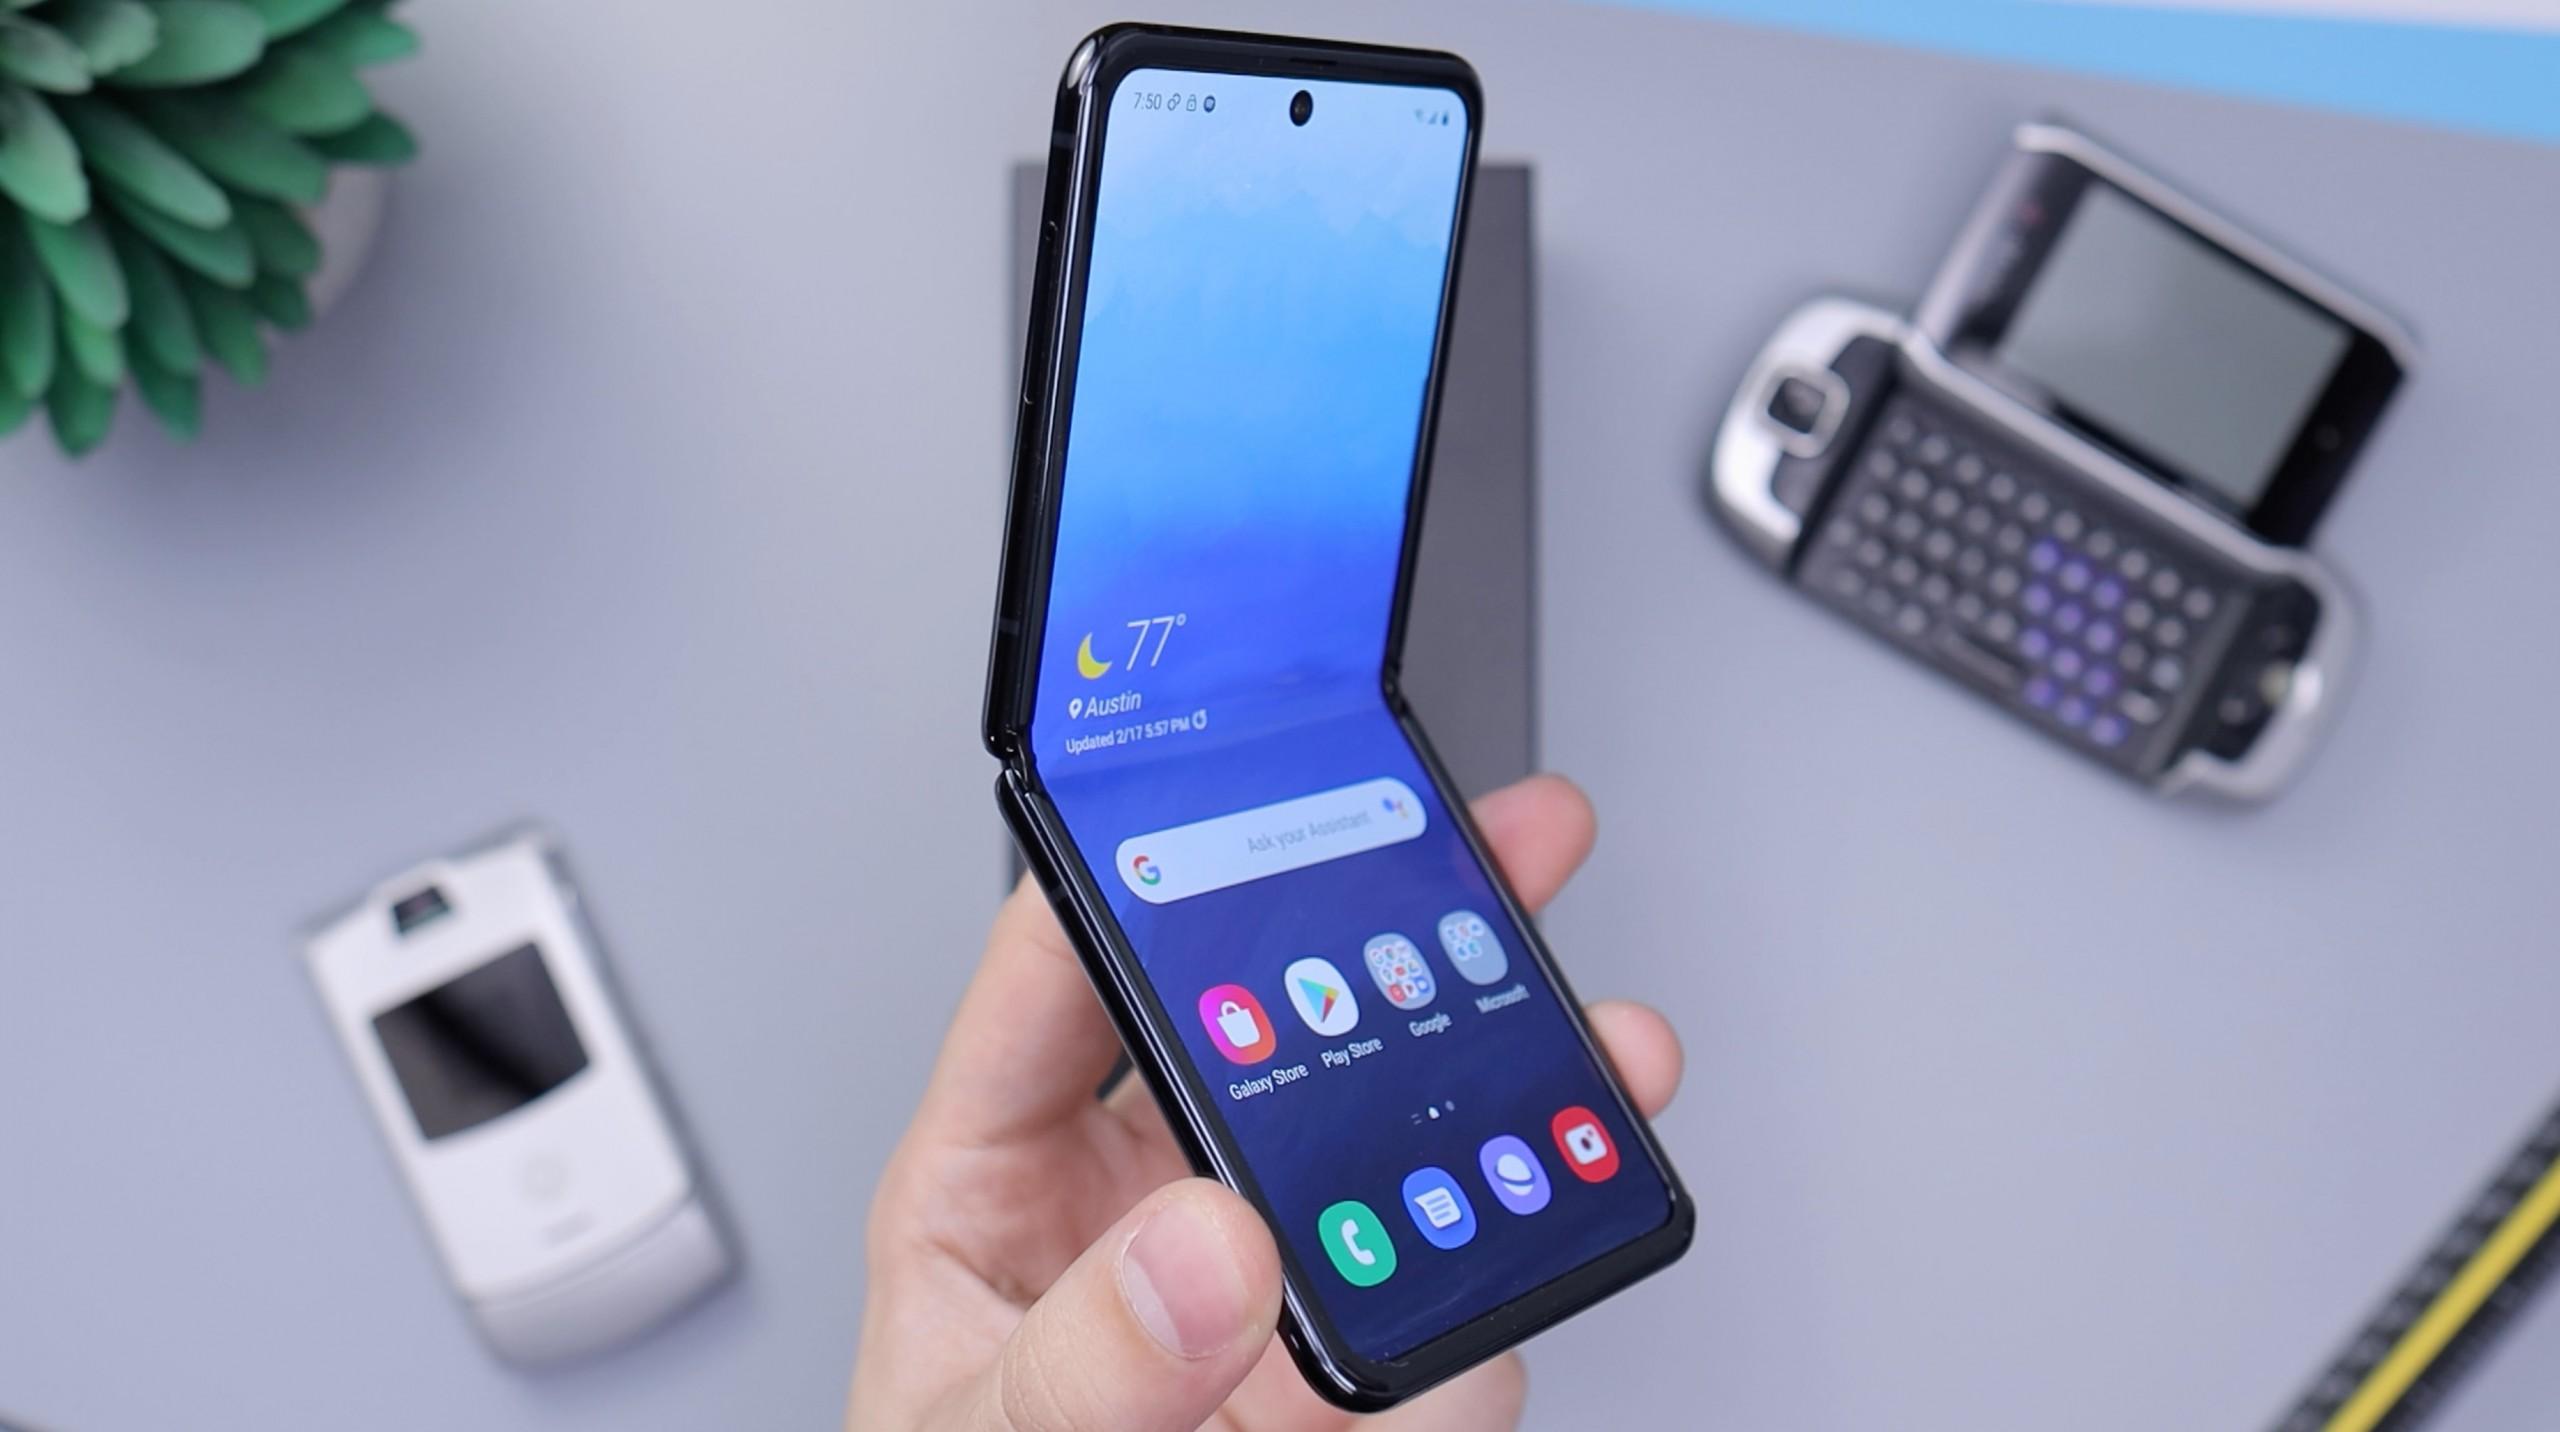 Galaxy Z Flip smartphone